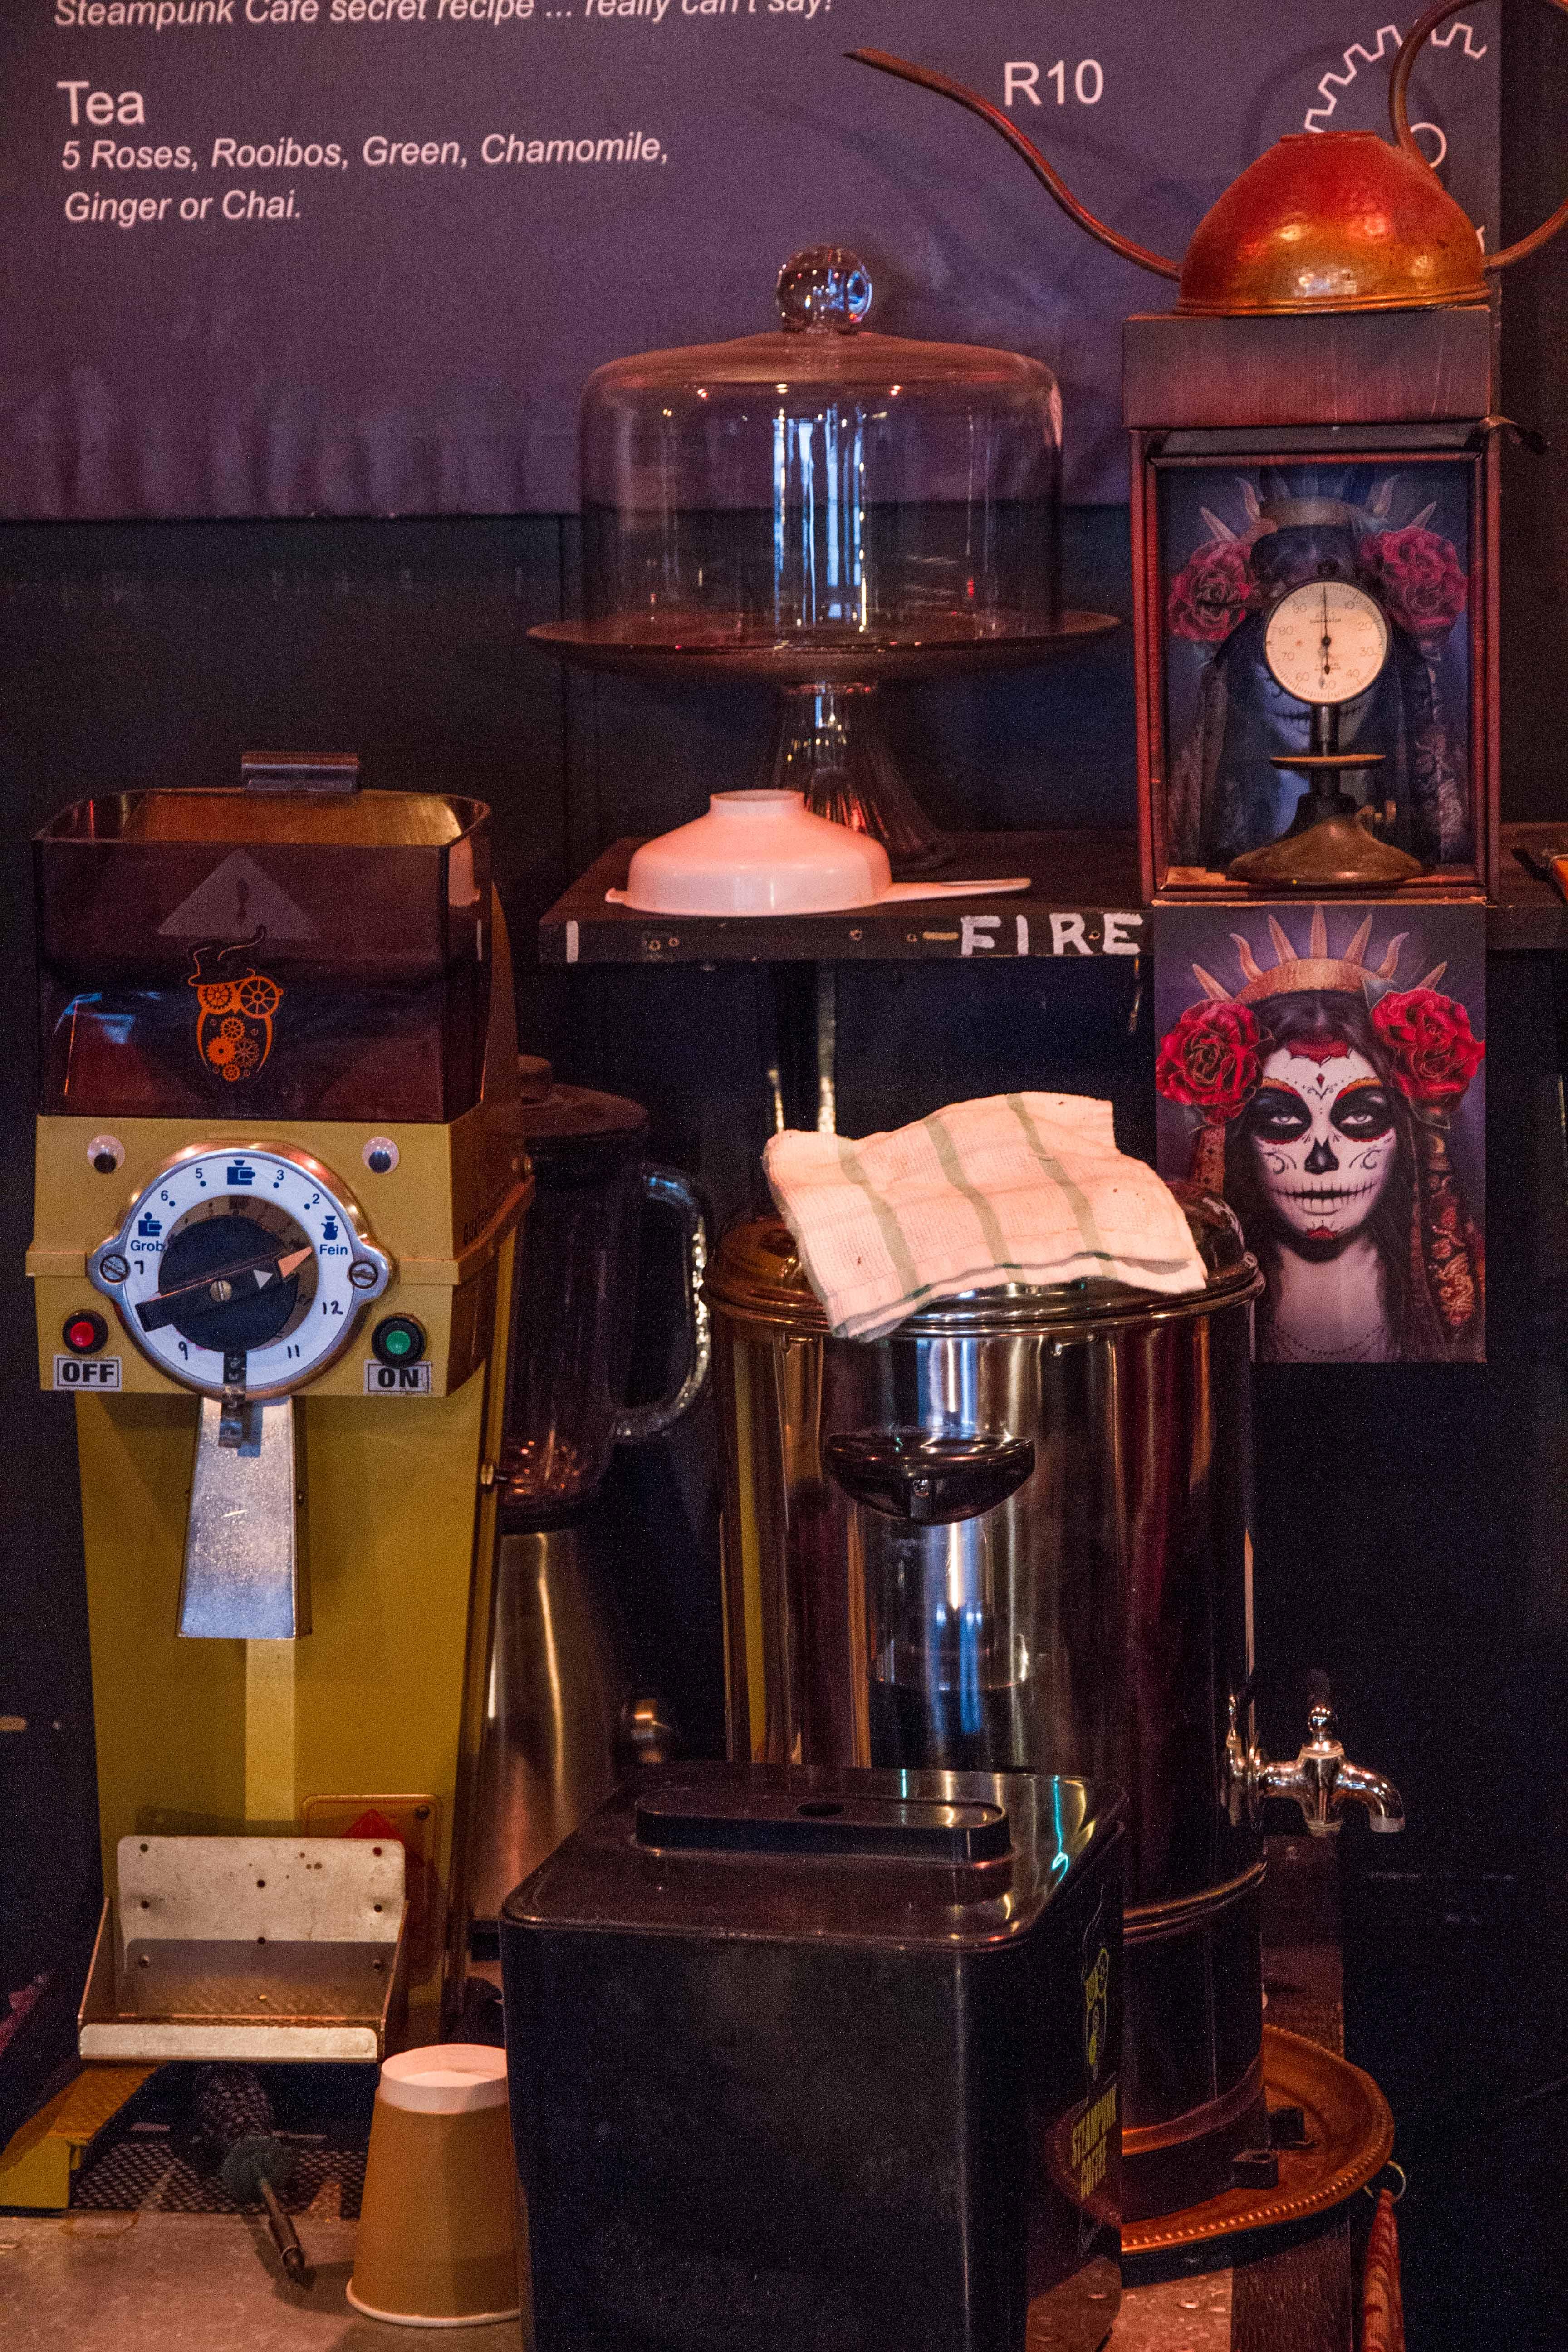 Steampunk Cafe (1)